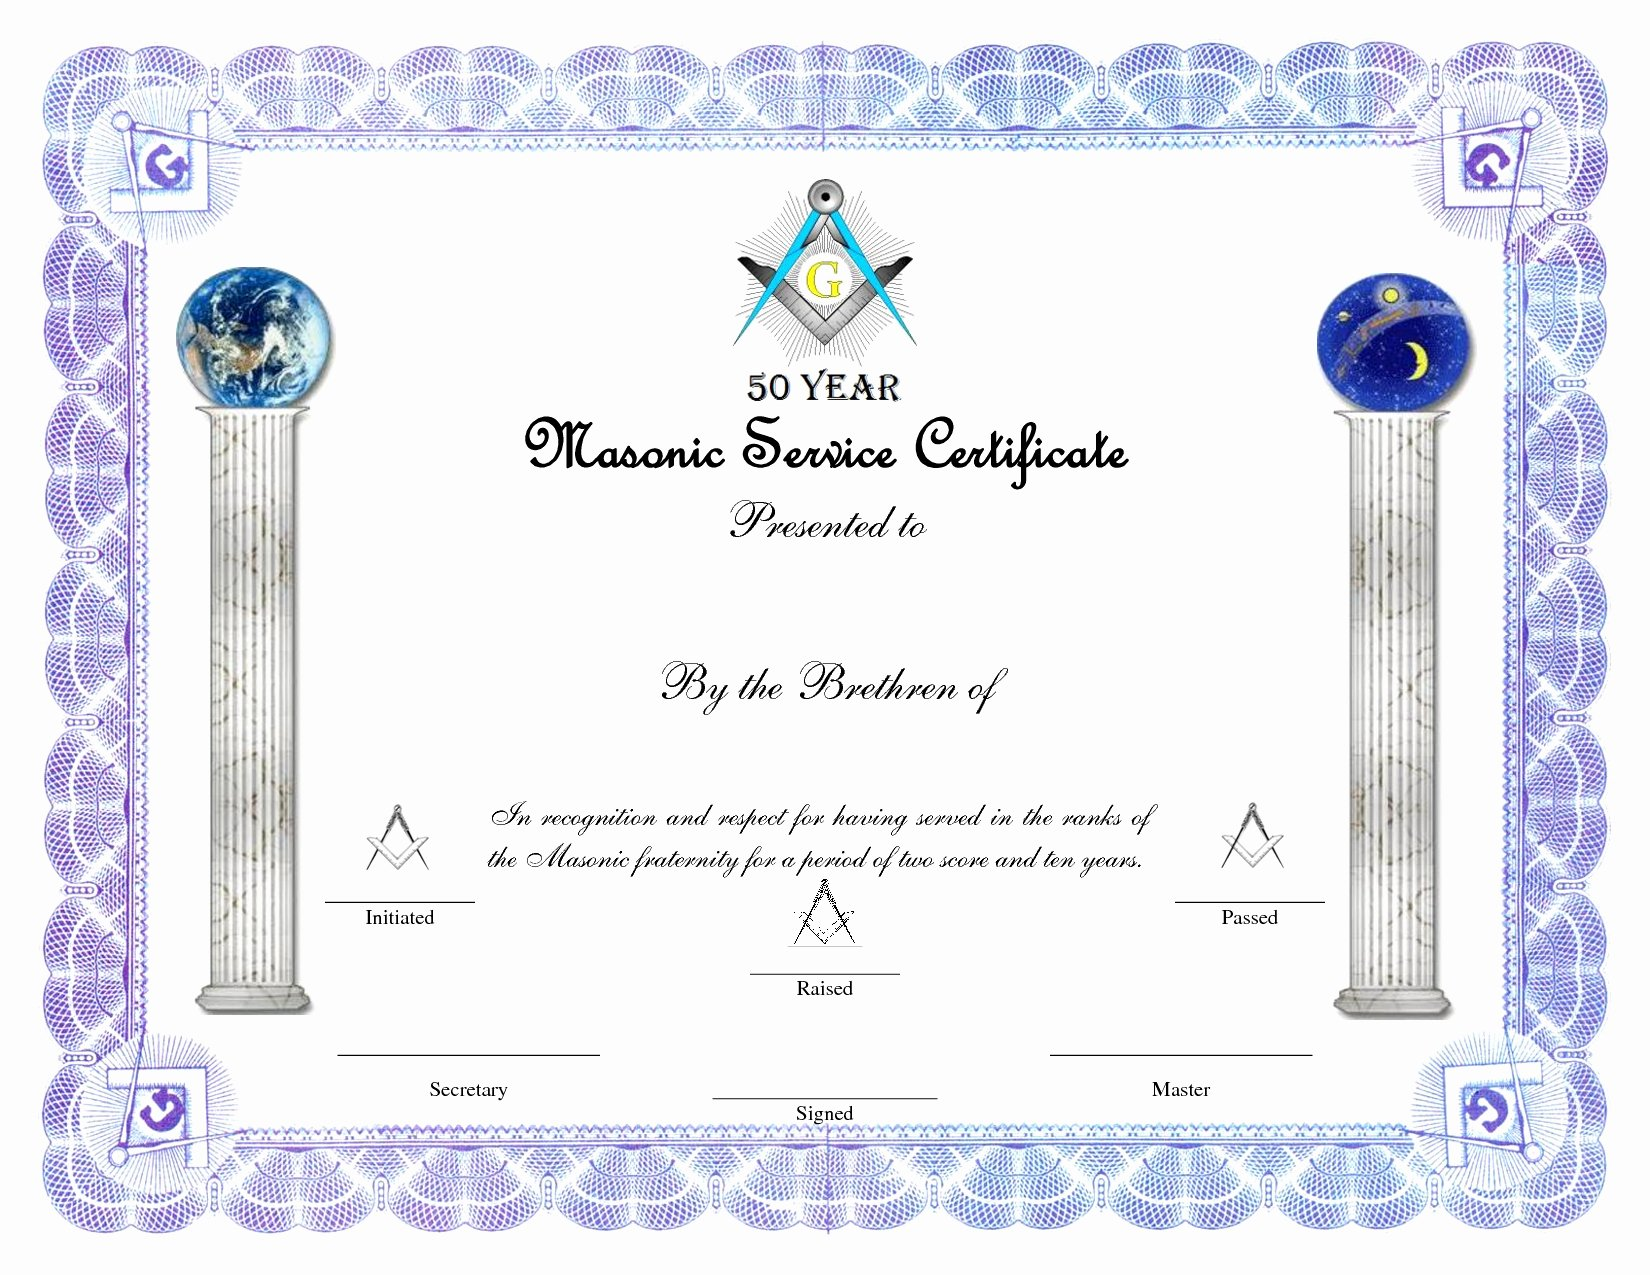 Masonic Certificate Of Appreciation Template Unique Masonic Certificate Template Free